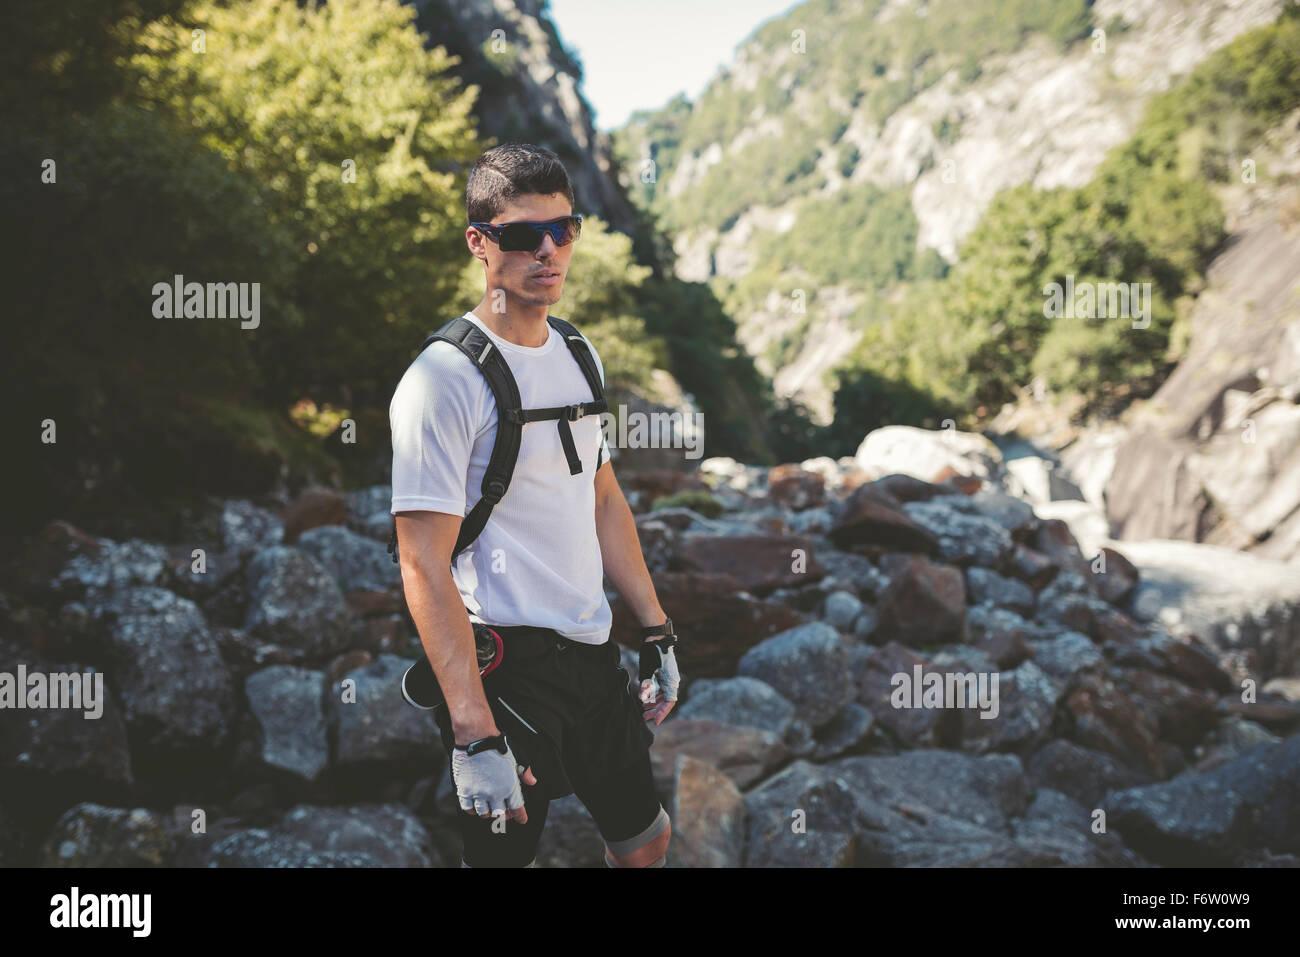 Ultra runner in mountains wearing sun glasses - Stock Image